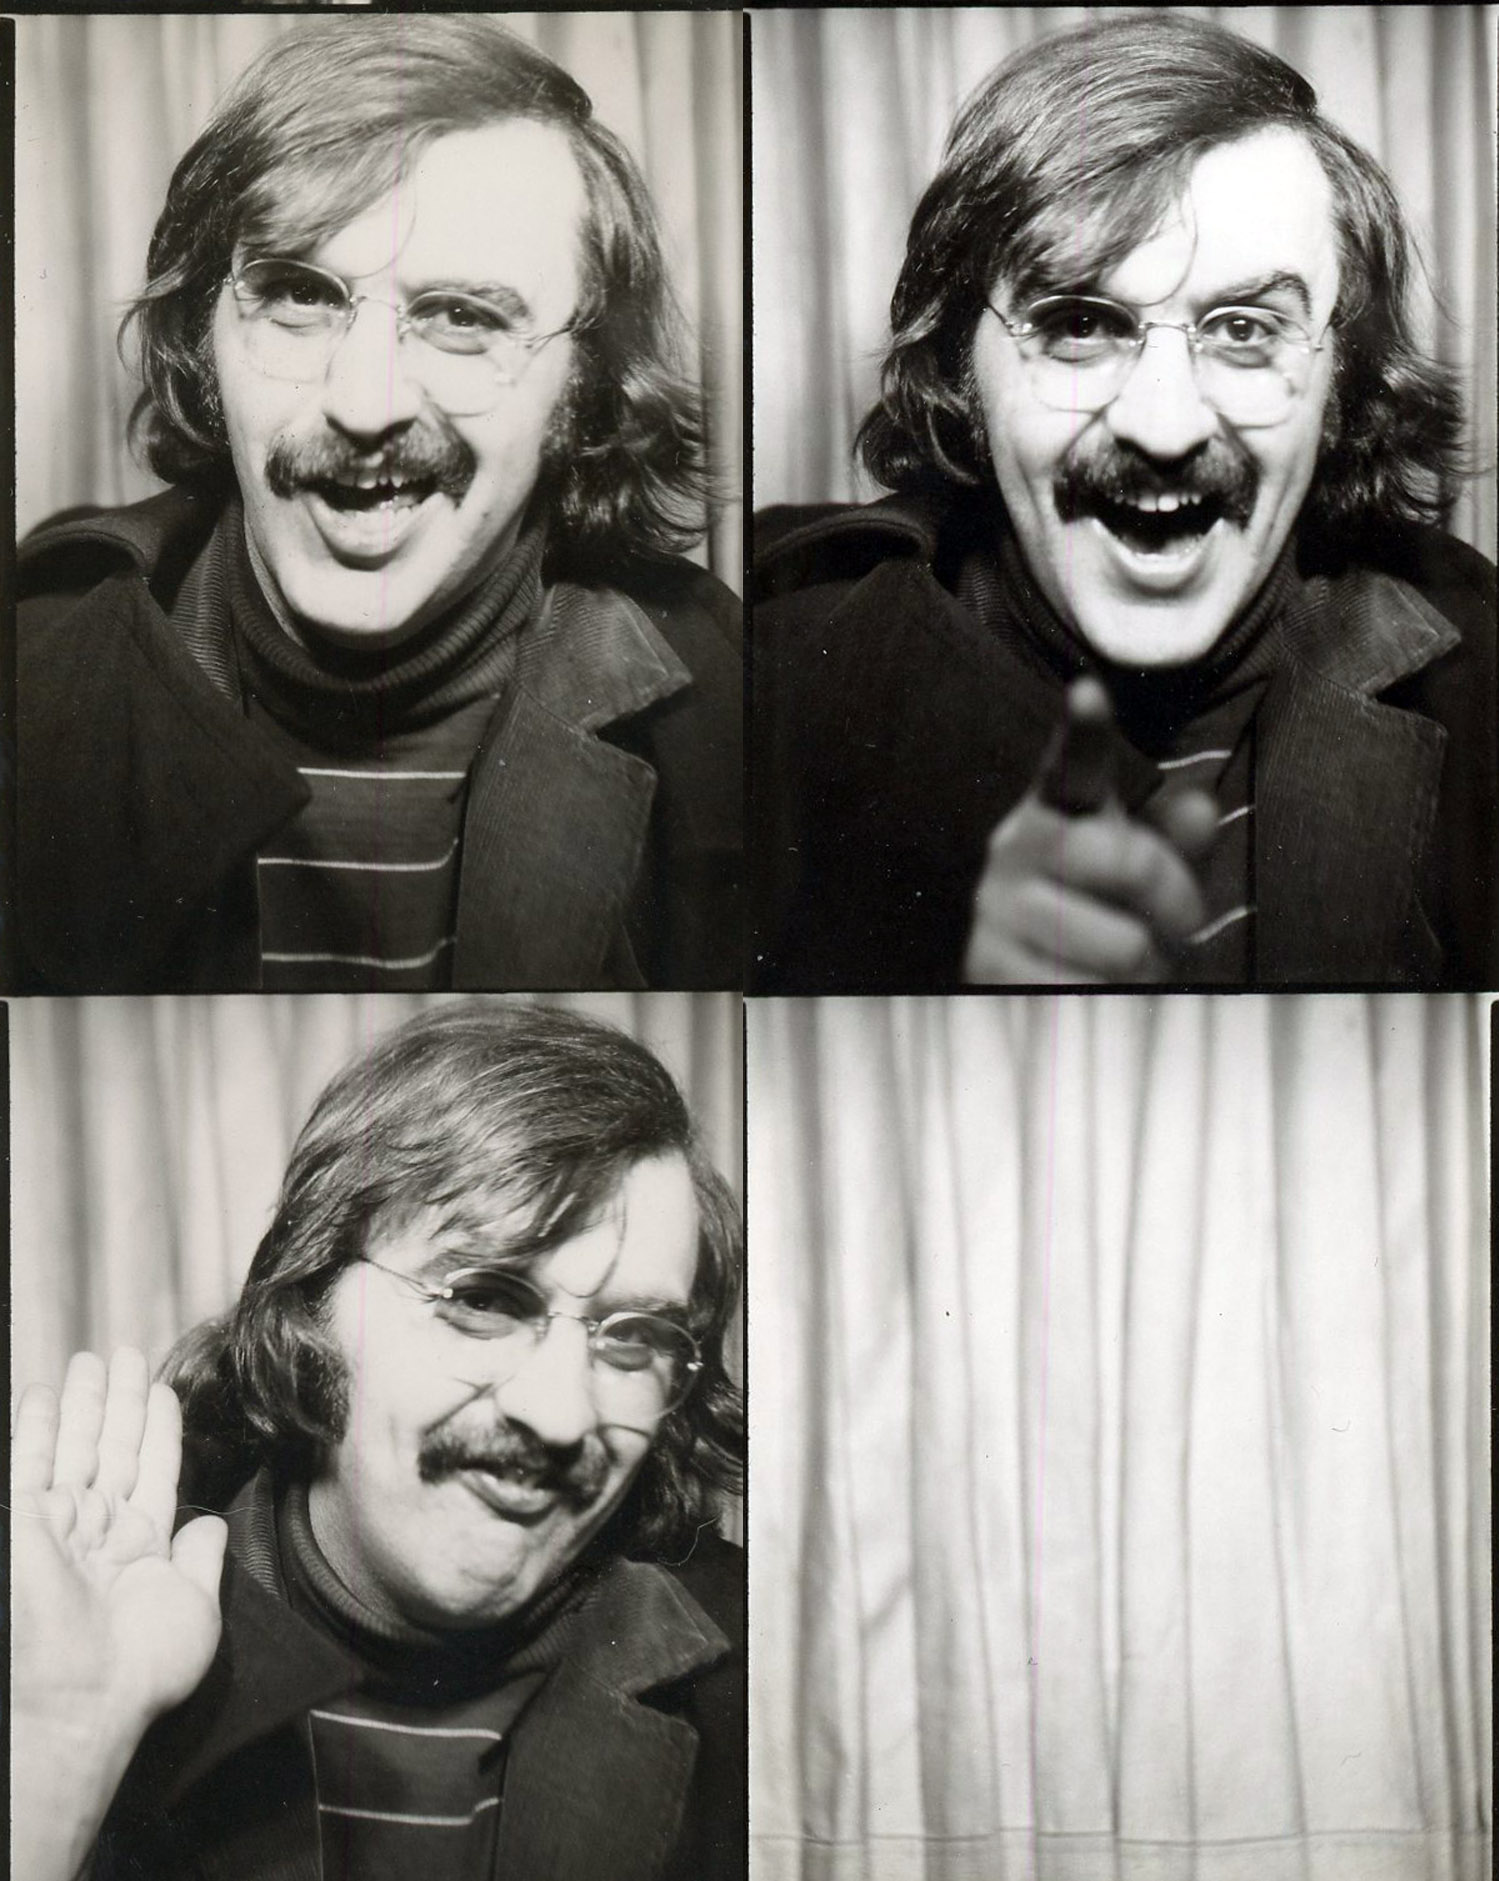 Mike in the photobooth on Mott Street, c. 1972